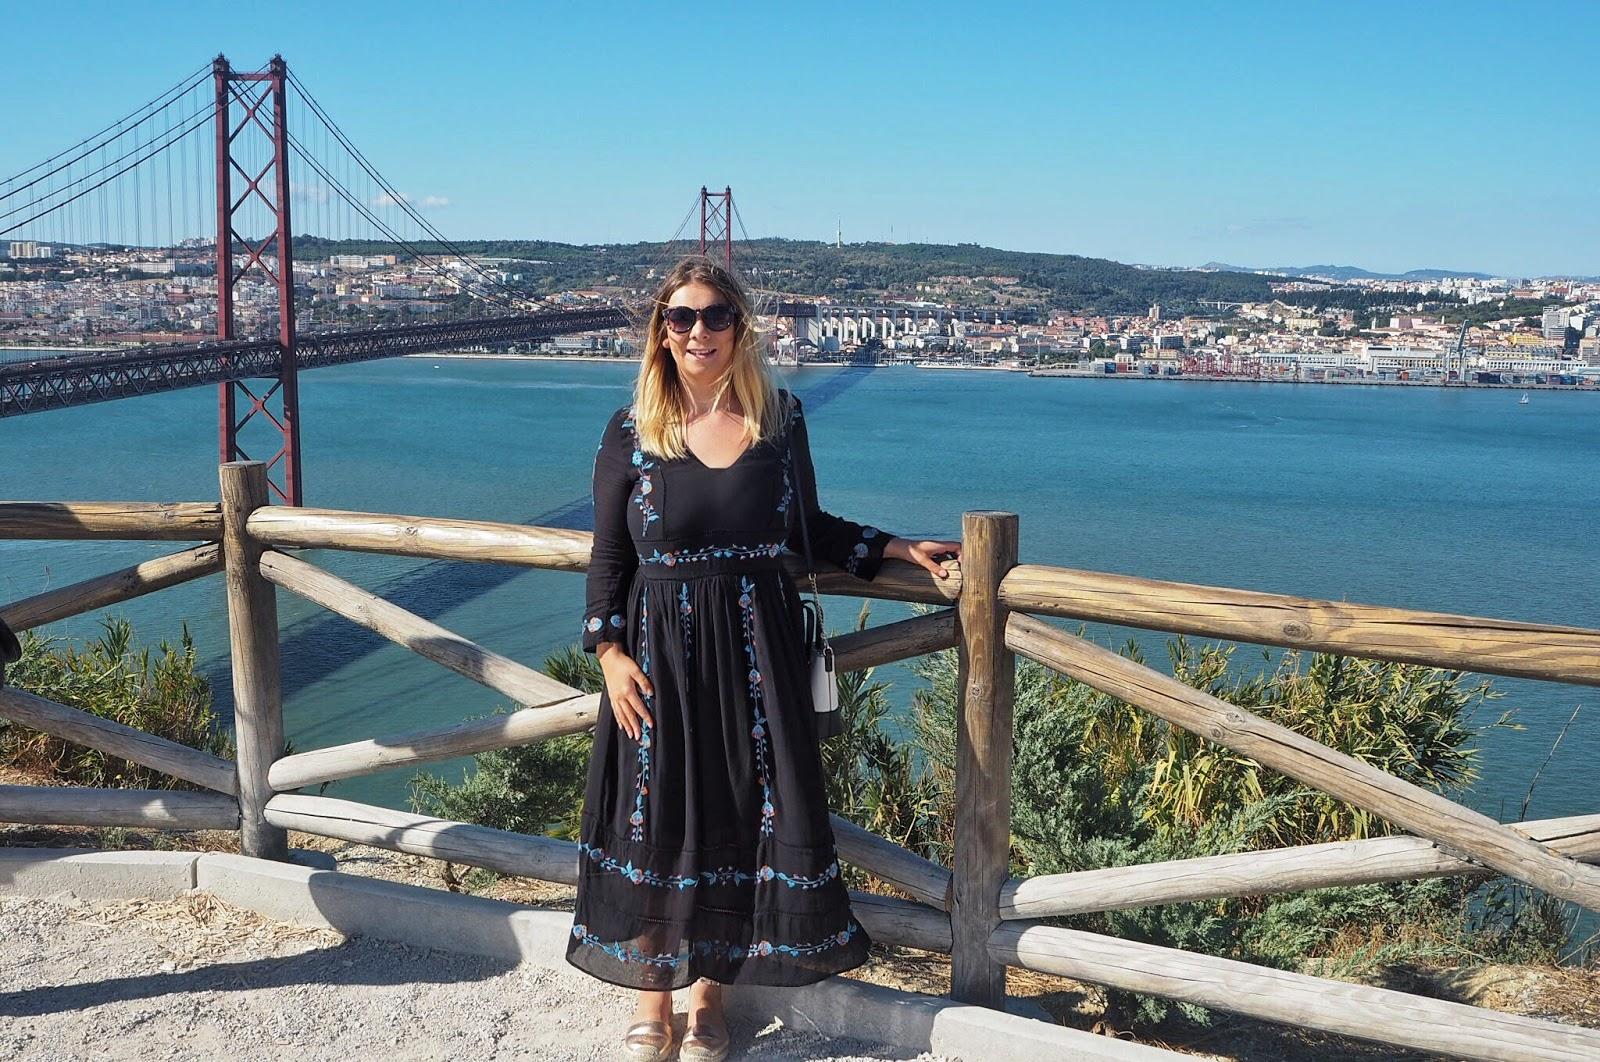 Doing it for the gram - posing near Lisbon's 25 de Abril bridge